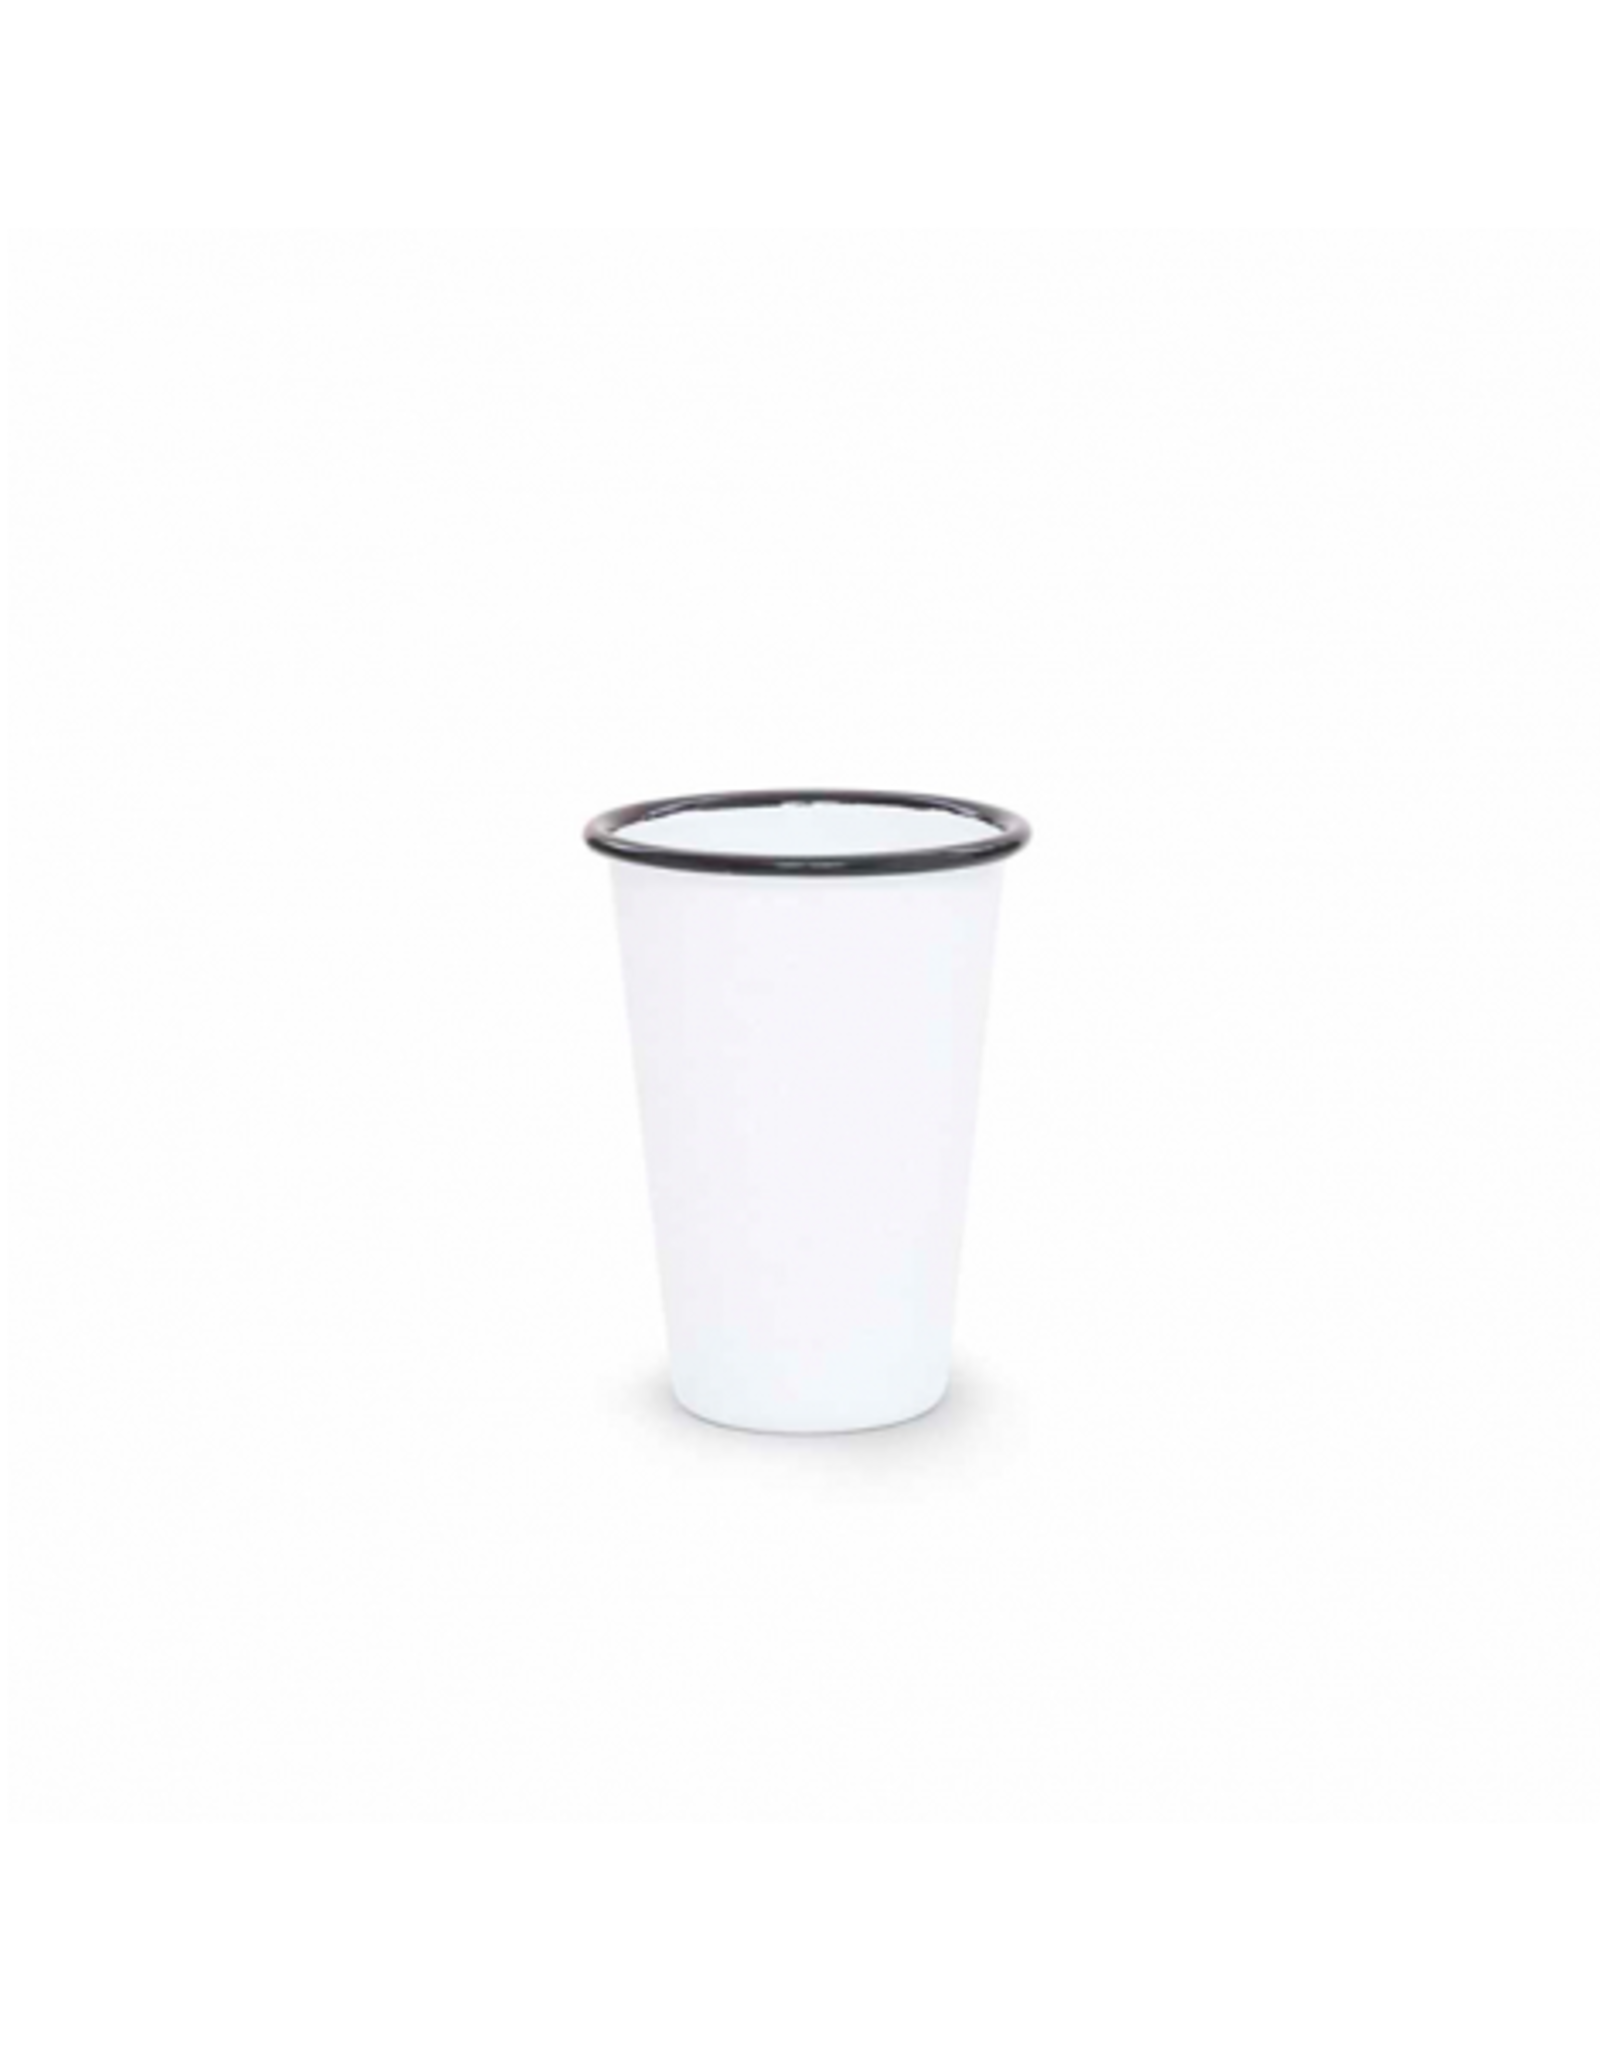 CON - Enamel Tumbler/White w Black Rim, Short, 14oz